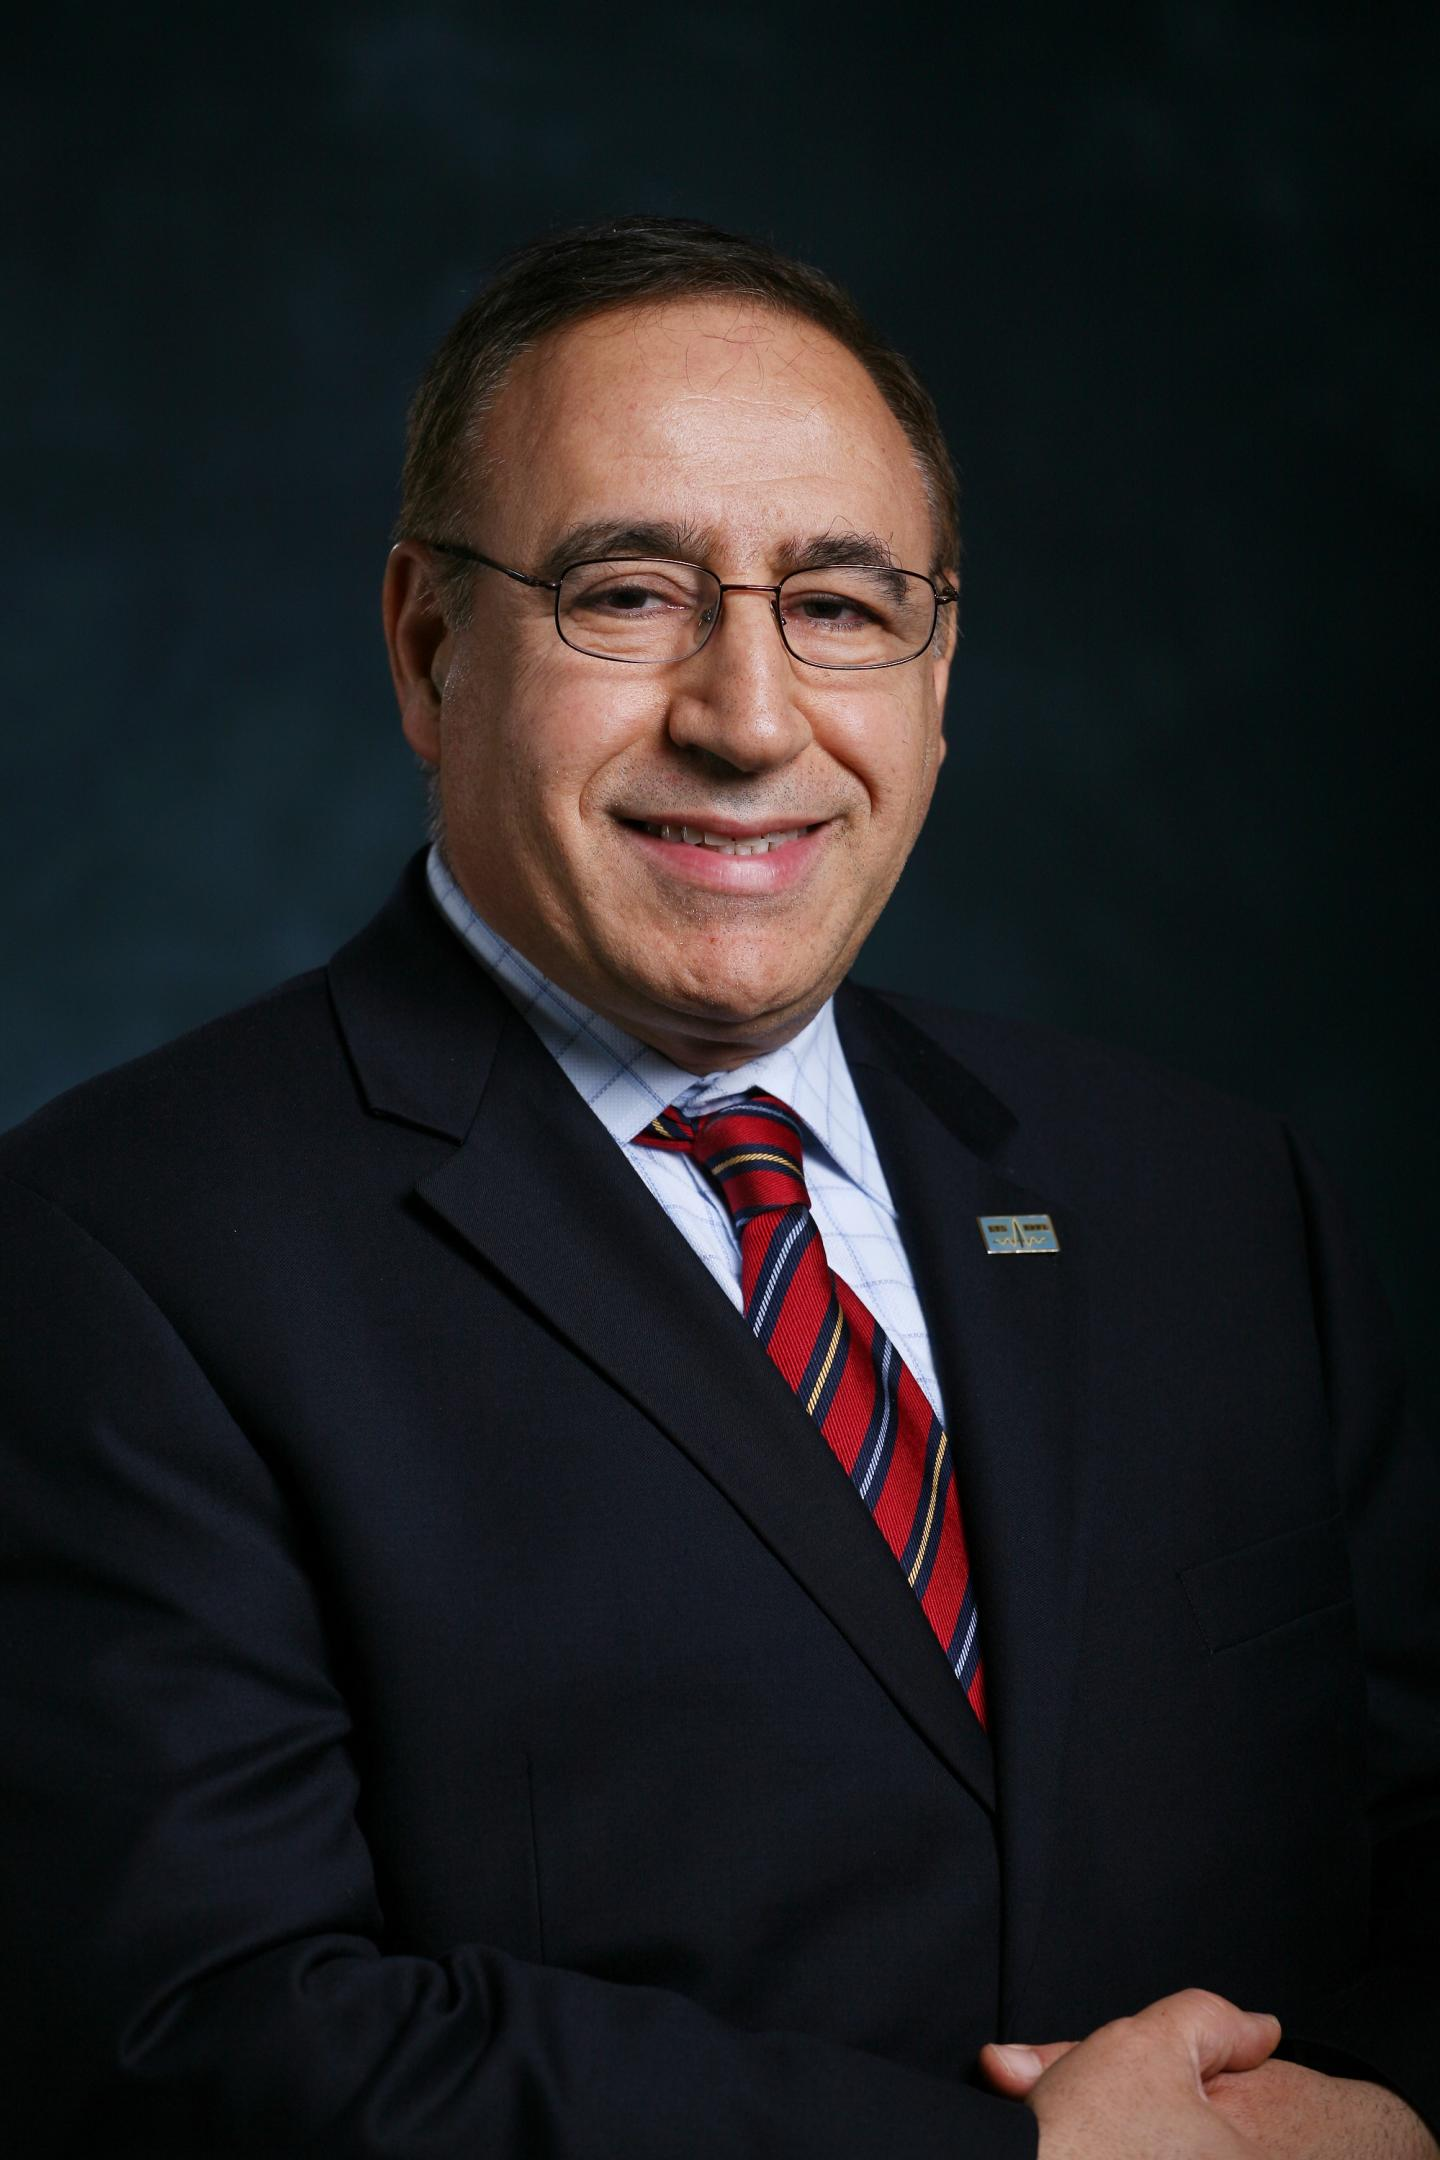 Metin Akay, University of Houston John S. Dunn Endowed Chair Professor of Biomedical Engineering and department chair